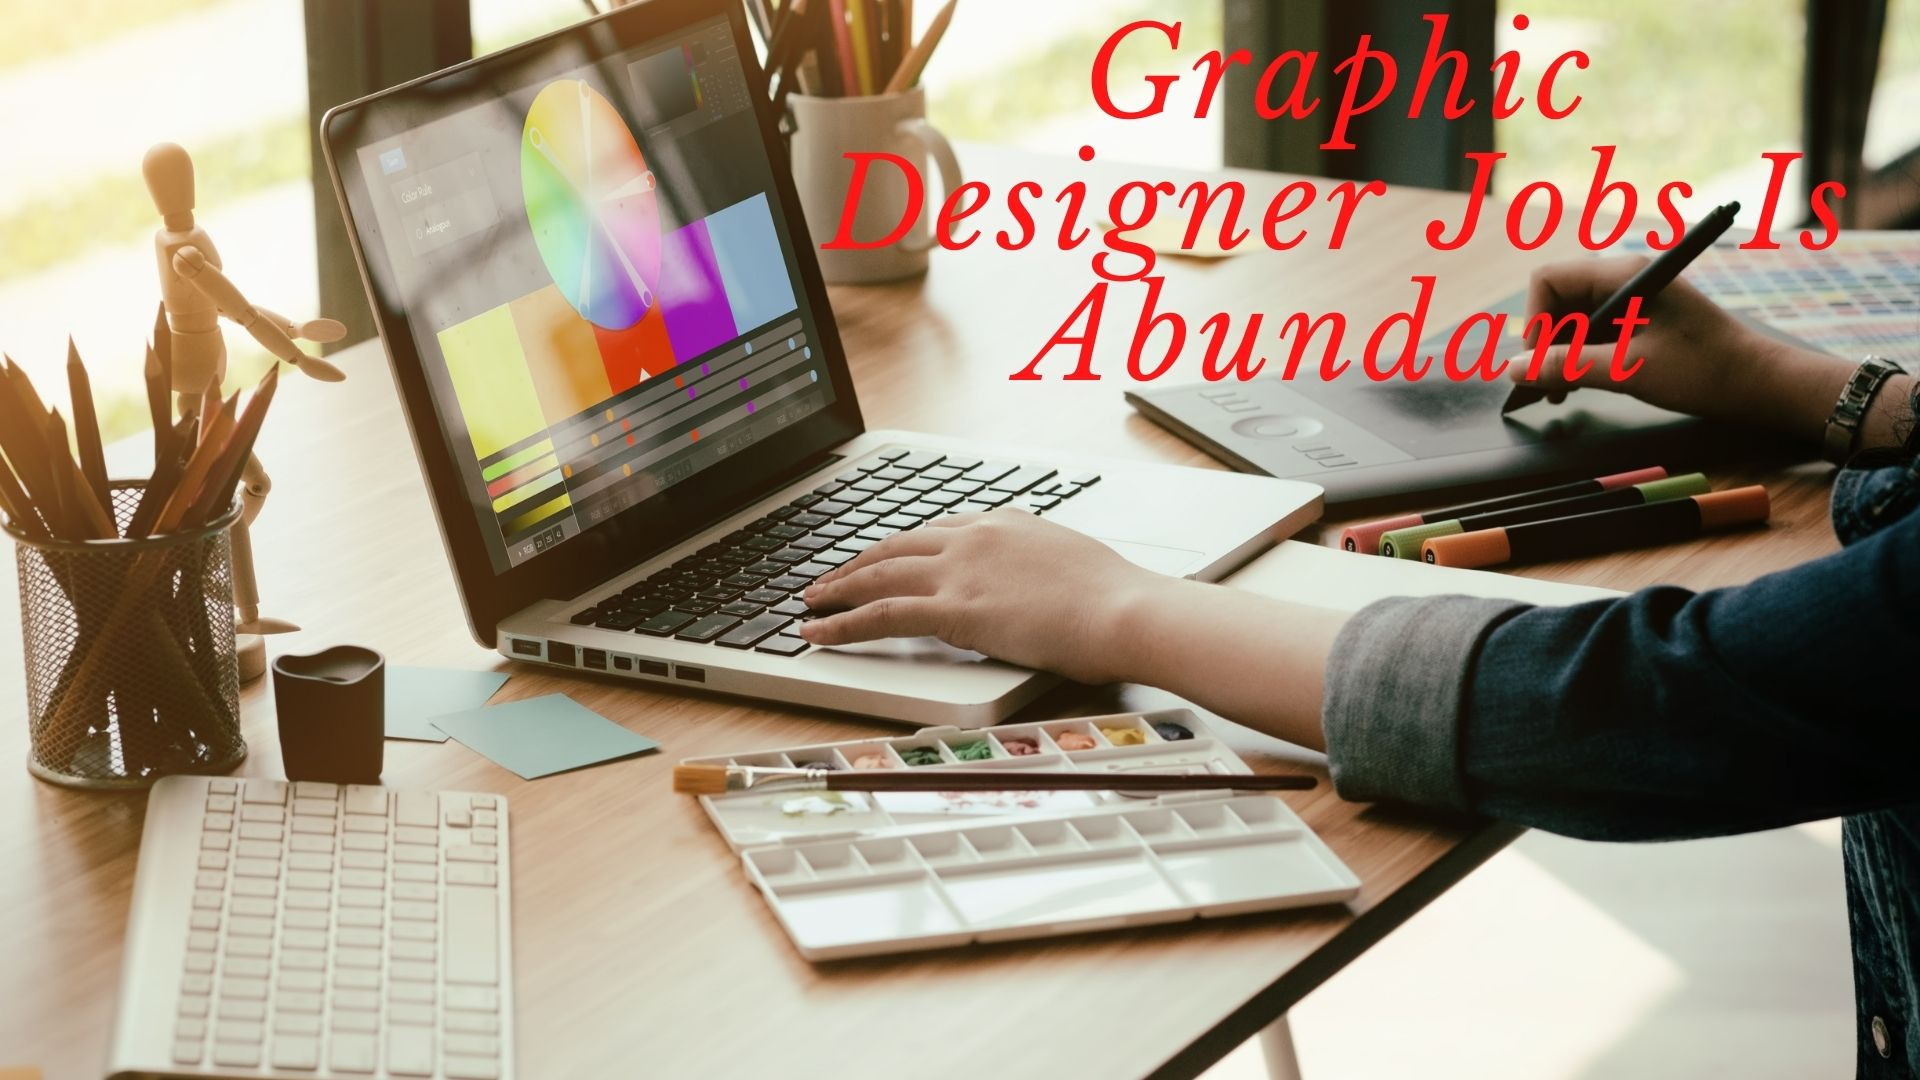 Graphic Designer Jobs Is Abundant